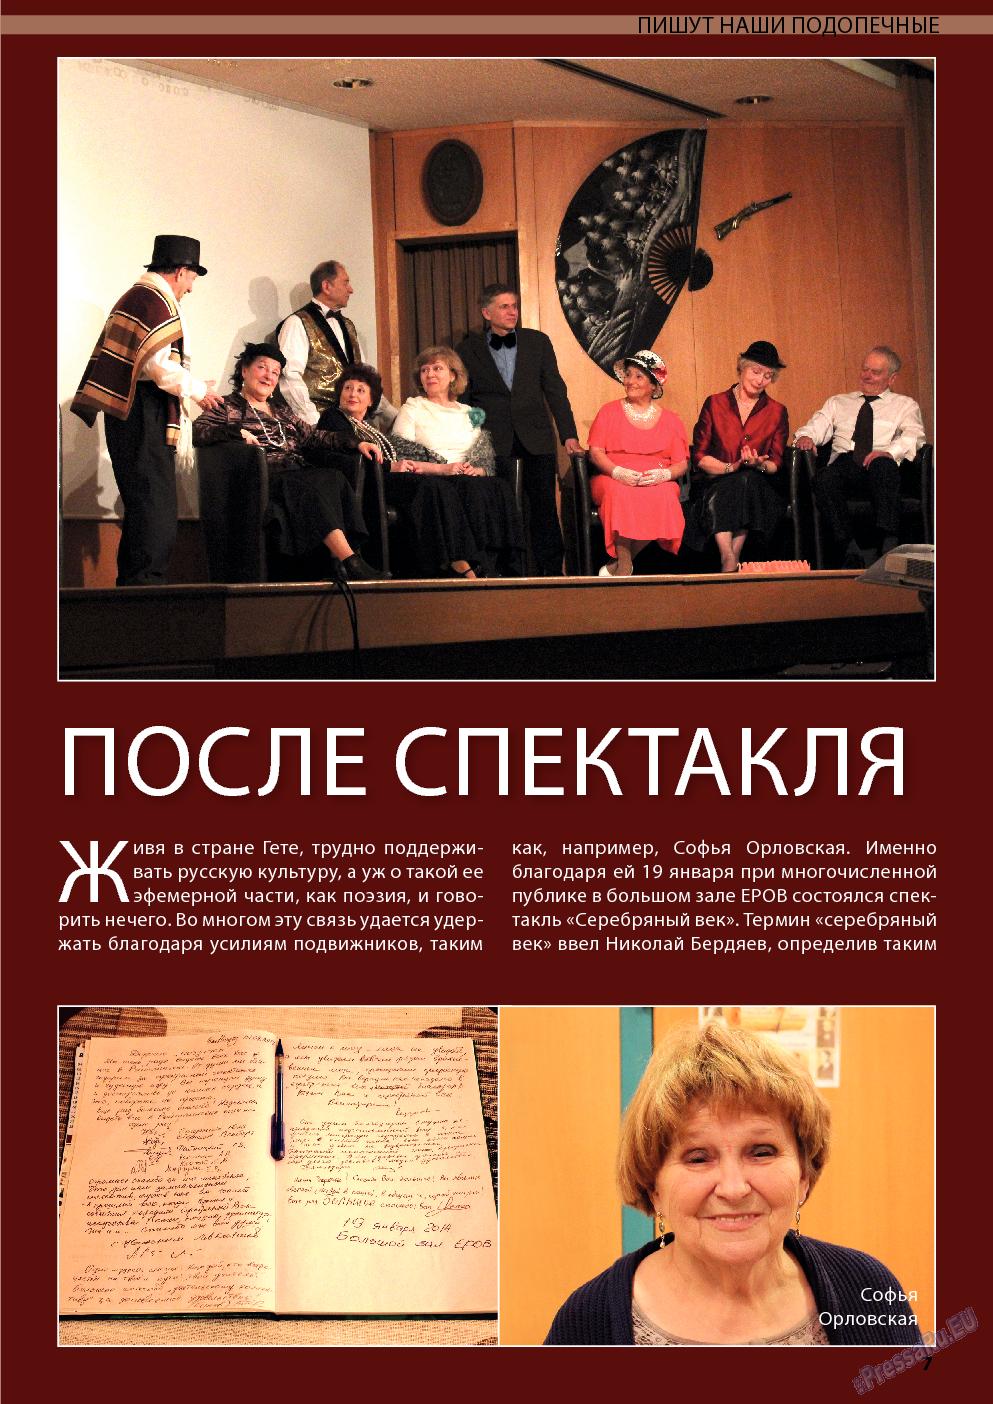 Wadim (журнал). 2014 год, номер 2, стр. 7